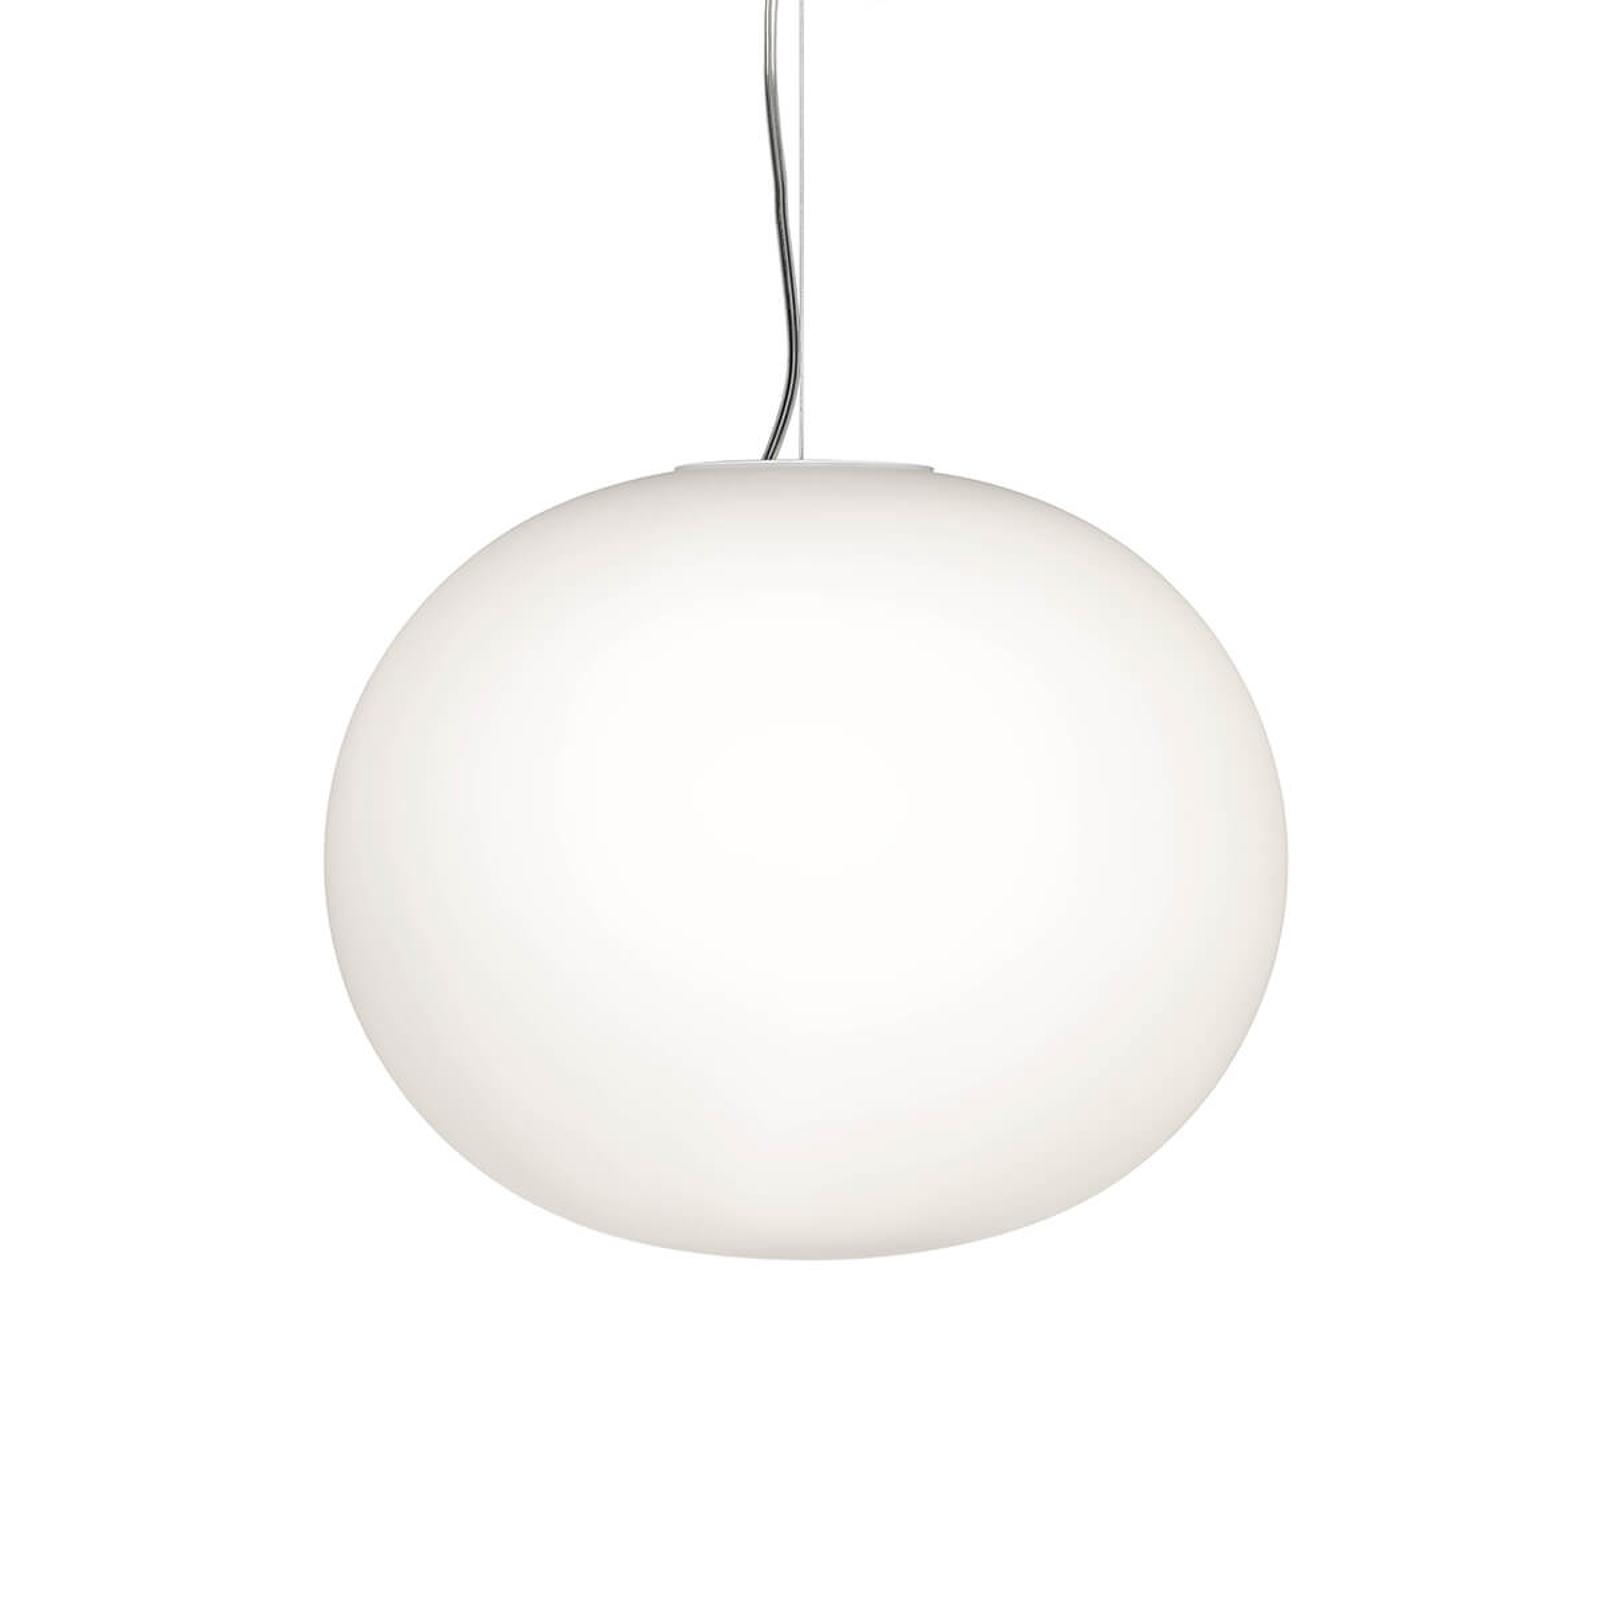 Bolvormige hanglamp GLO-BALL, 33 cm